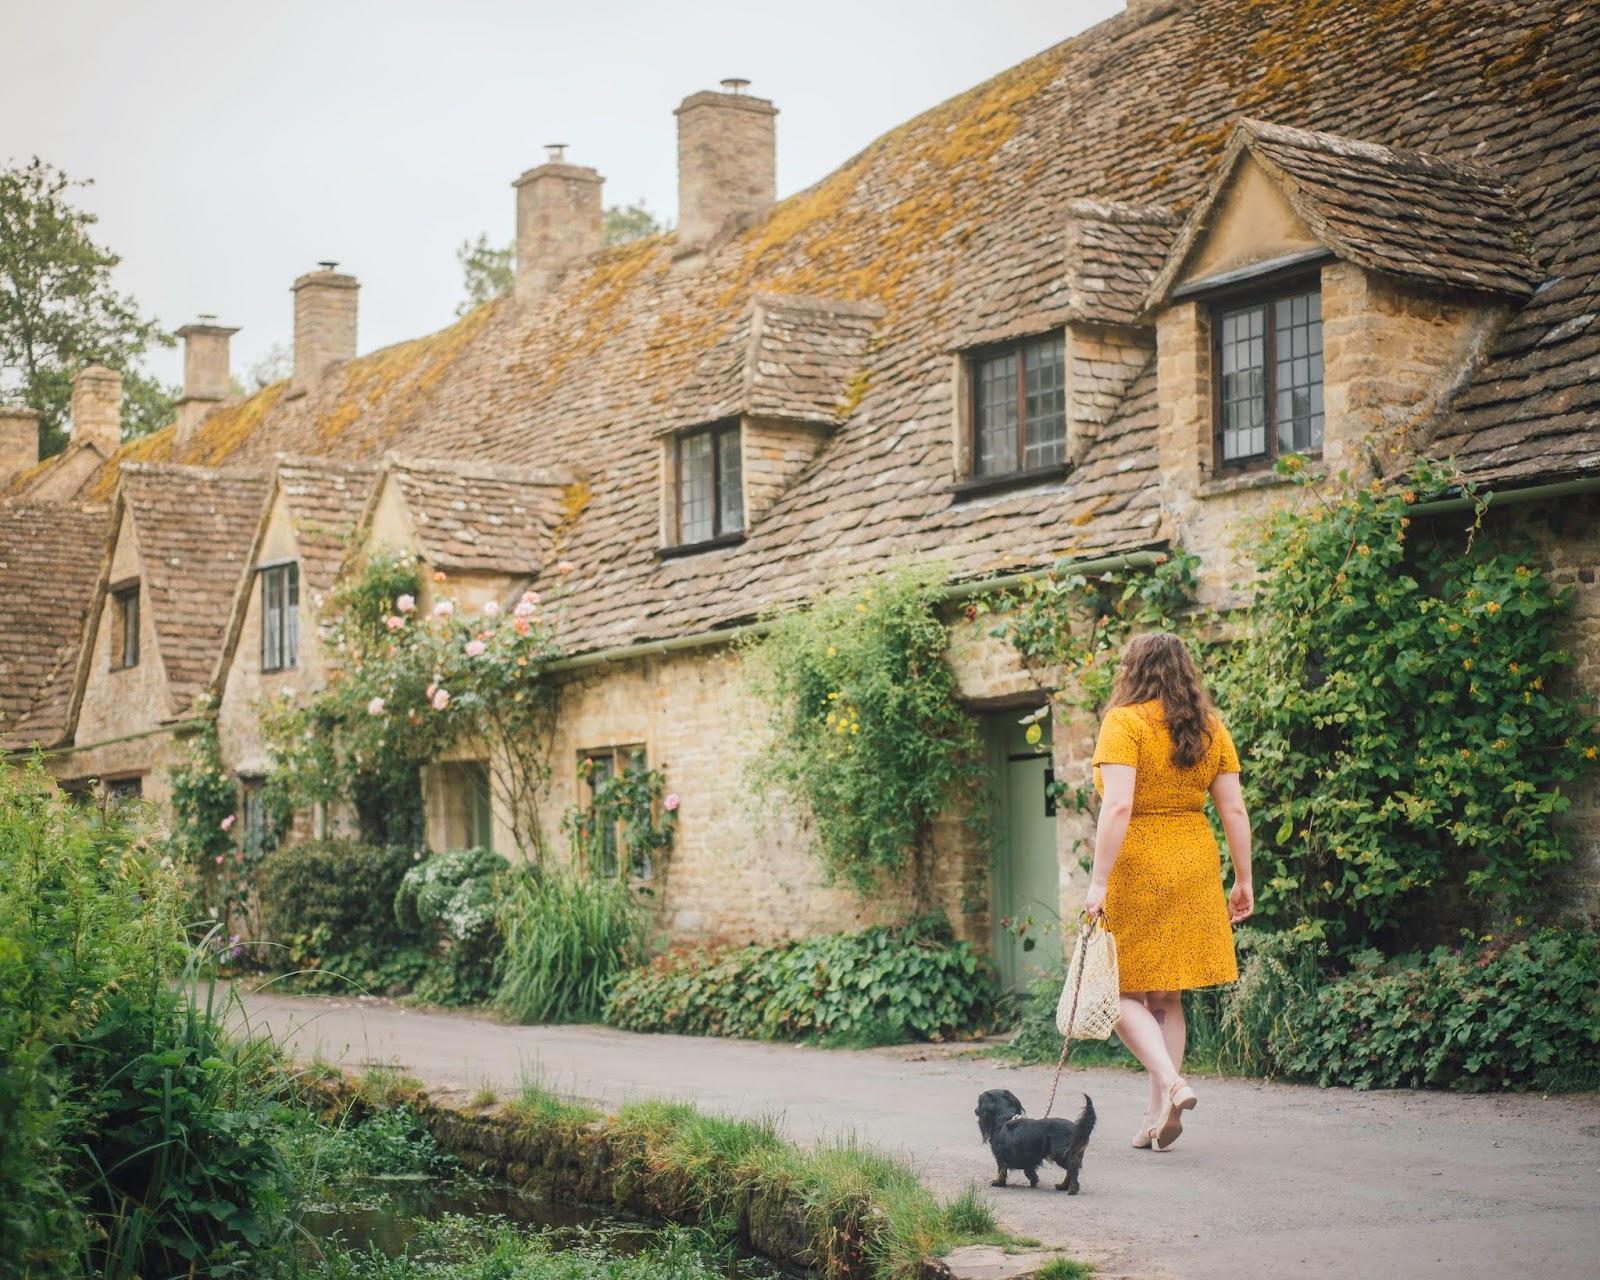 cotswolds instagram spot arlington row bibury dachshund liquid grain